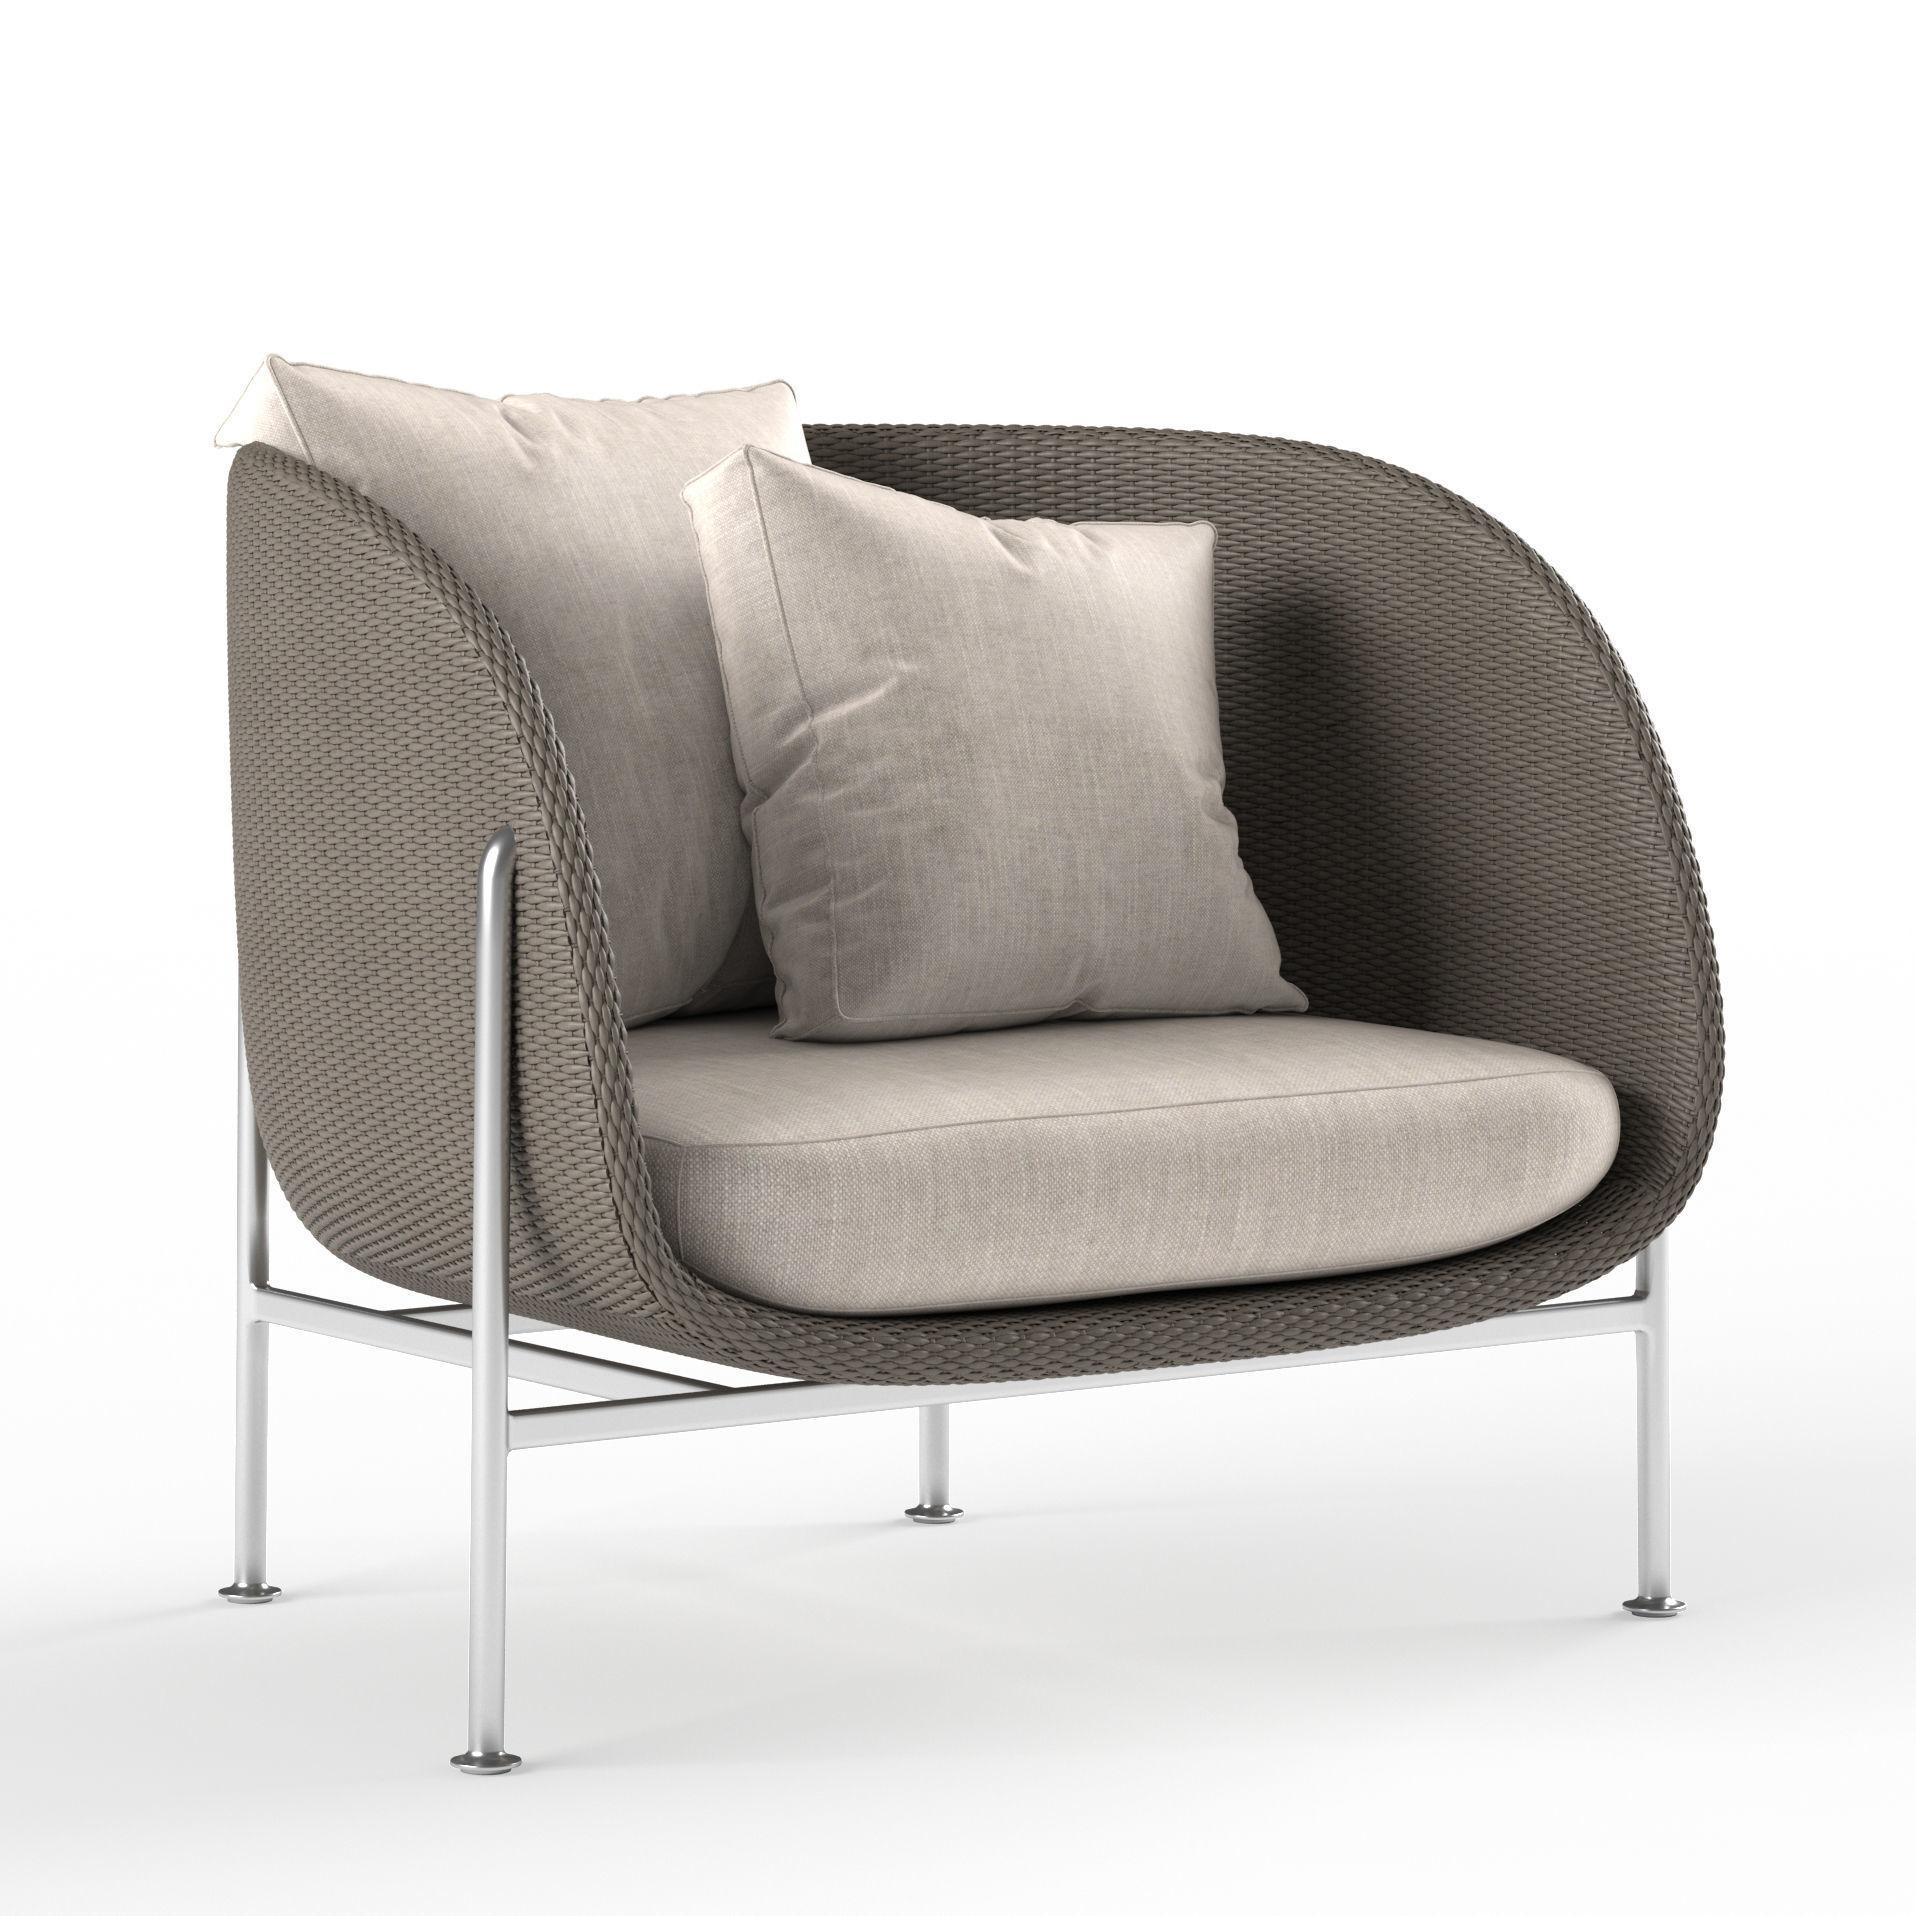 Janus and Cie Gina armchair